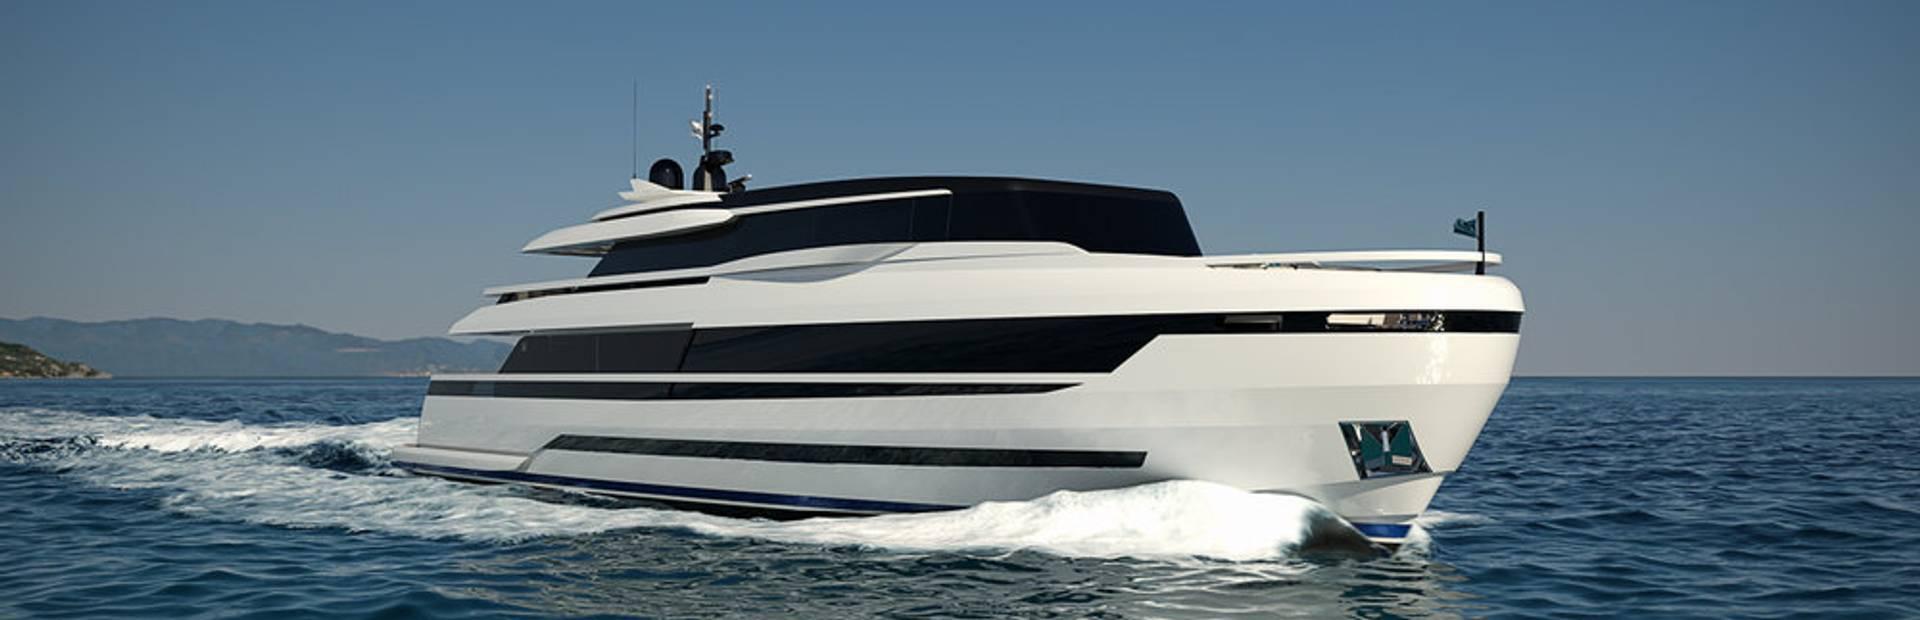 ISA Extra 126 Yacht Charter